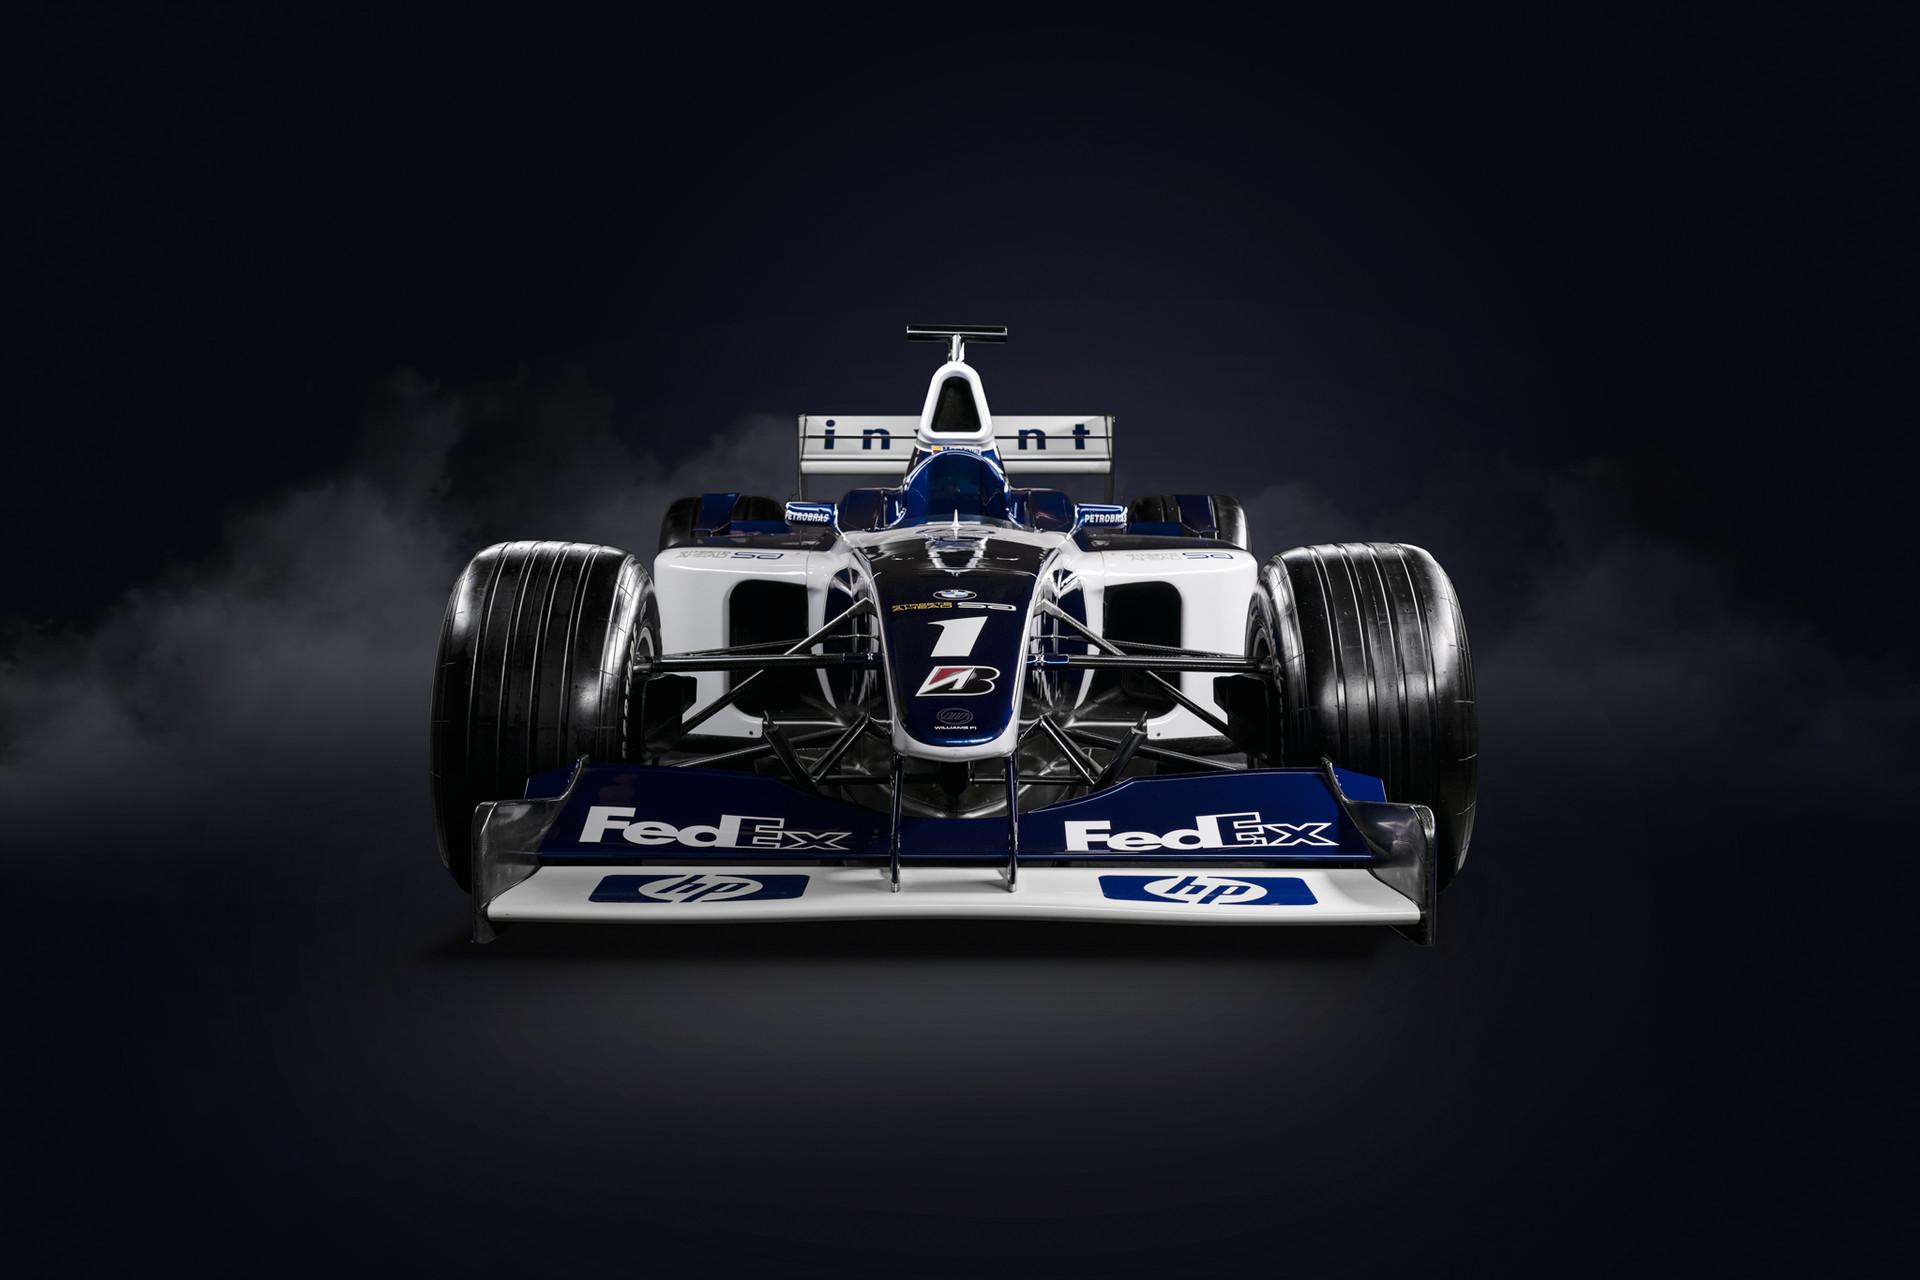 FW23 F1 (2 of 5).jpg